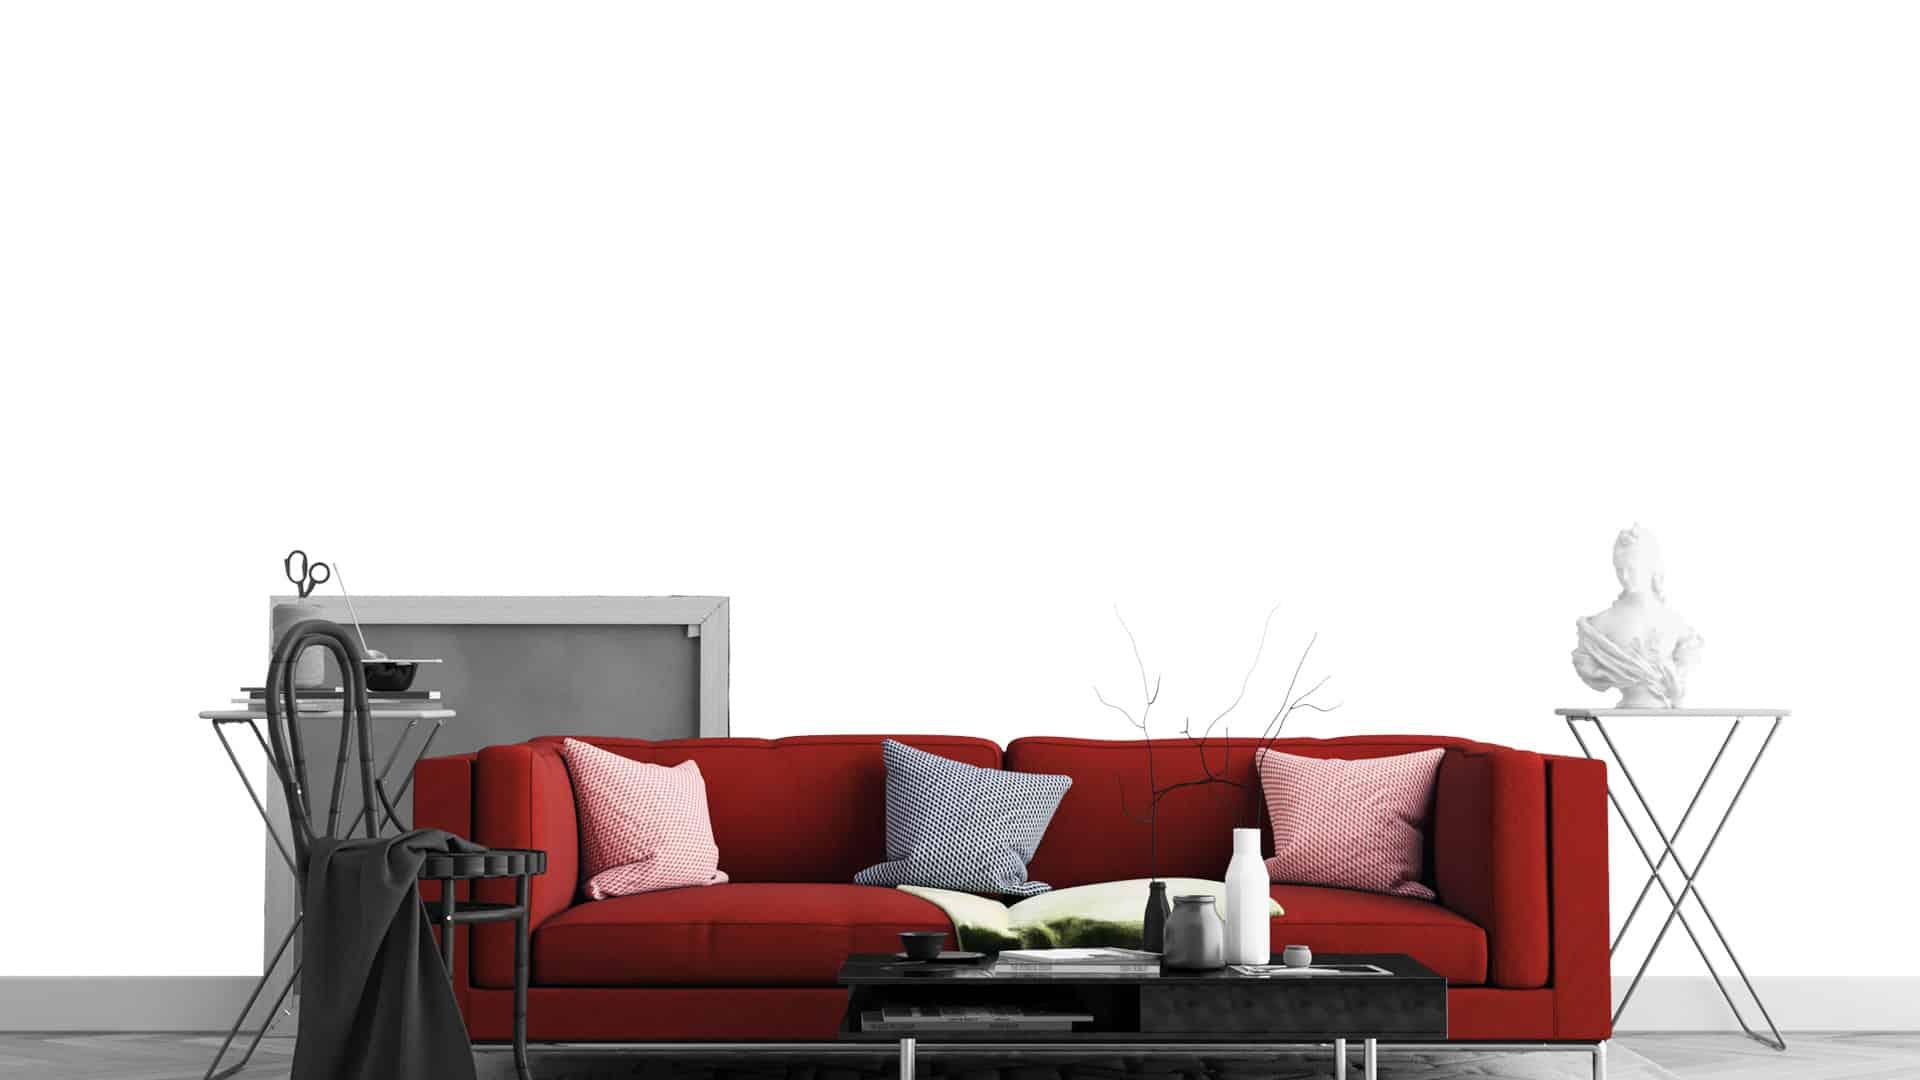 fondo-proximamente-feria-mueble-yecla